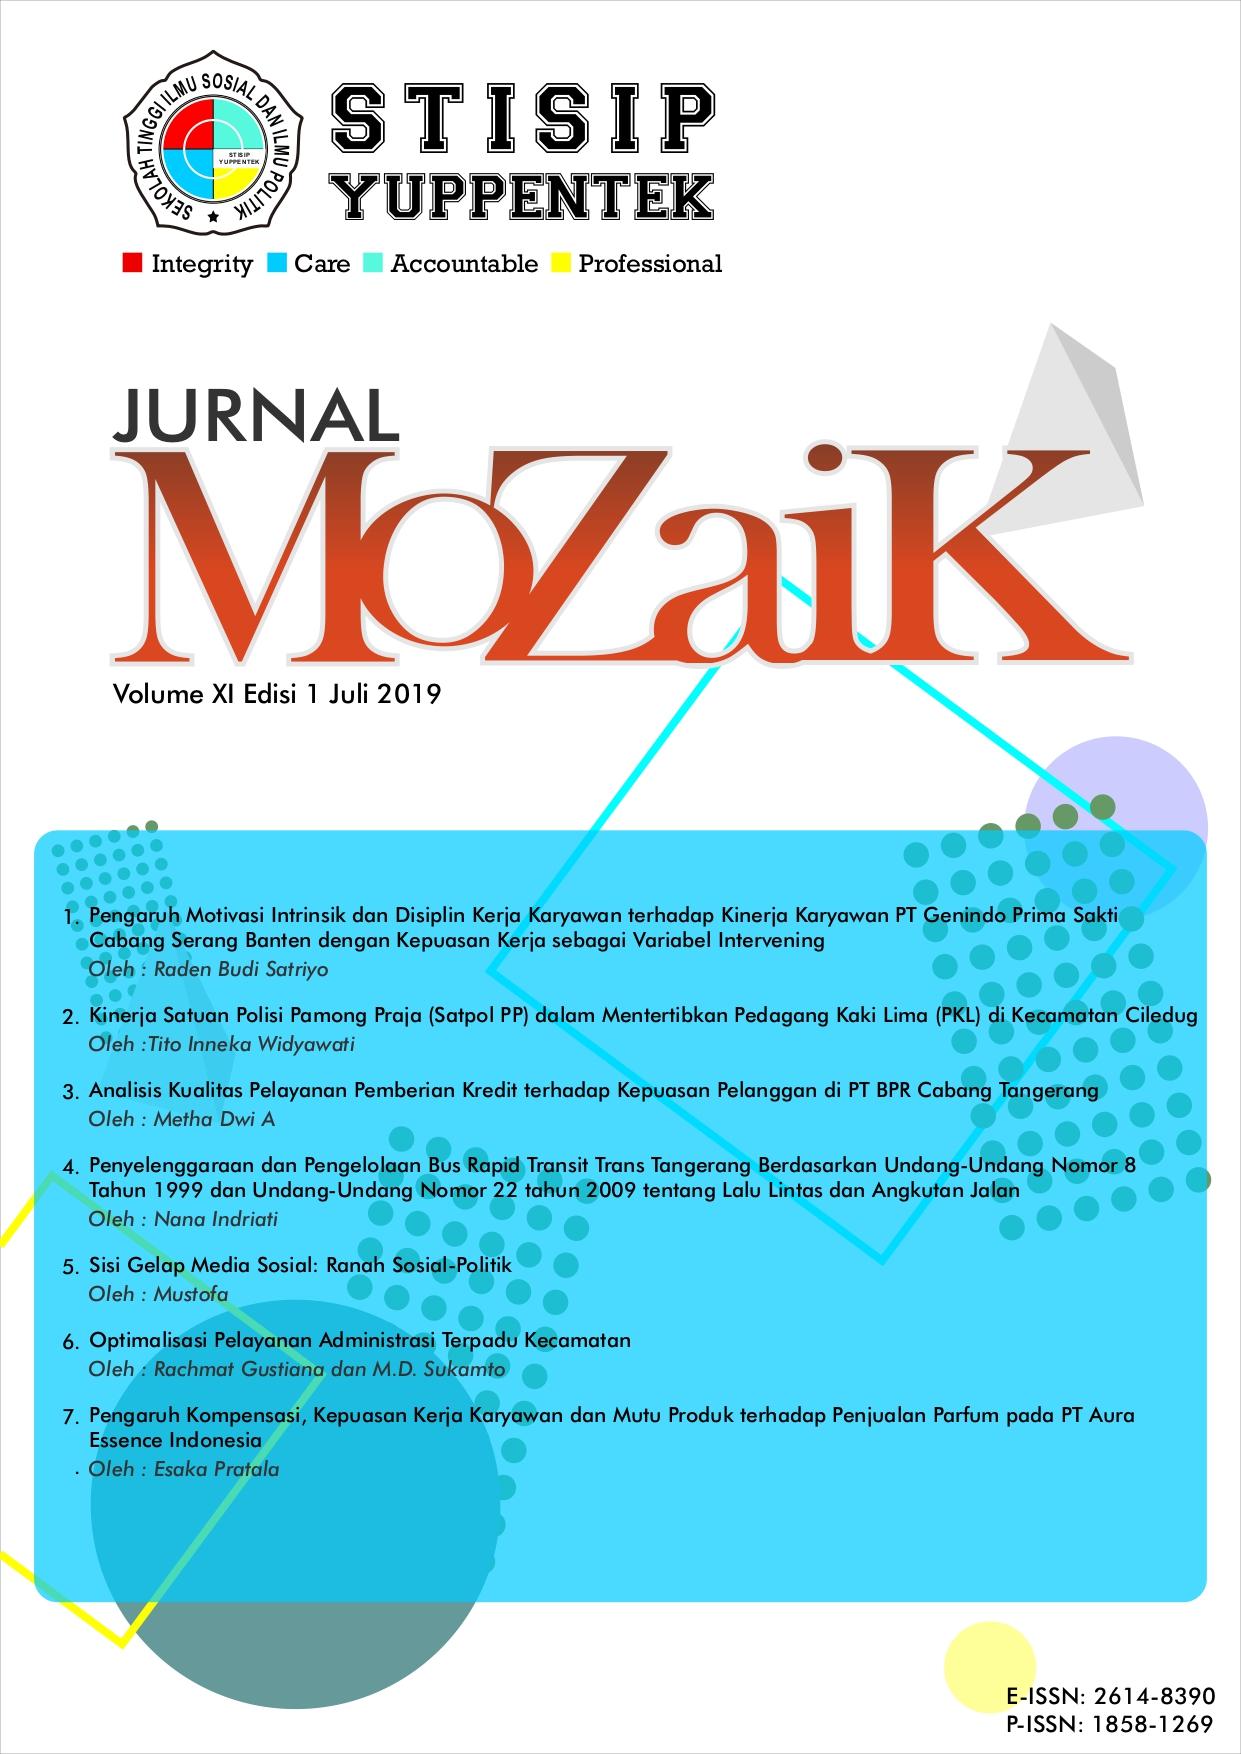 Lihat Vol 11 No 1 (2019): Jurnal Mozaik